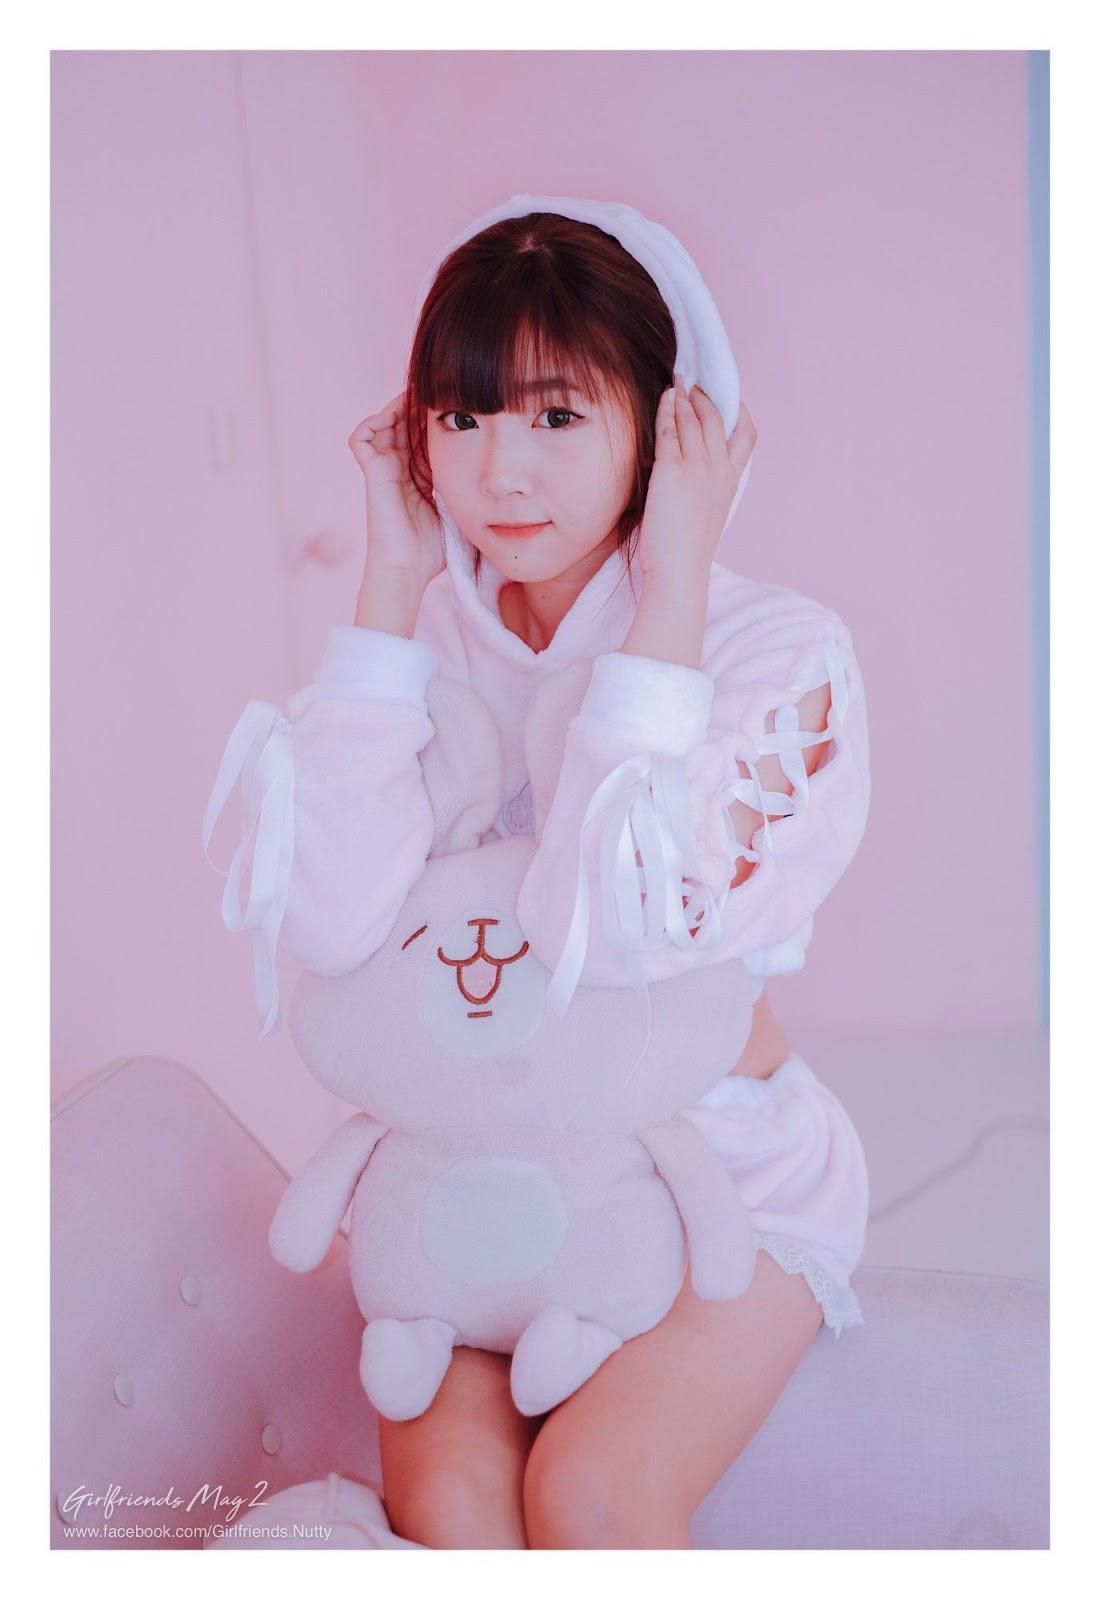 Image Thailand Model - Pakkhagee Arkornpattanakul - Pink Bunny - TruePic.net - Picture-3